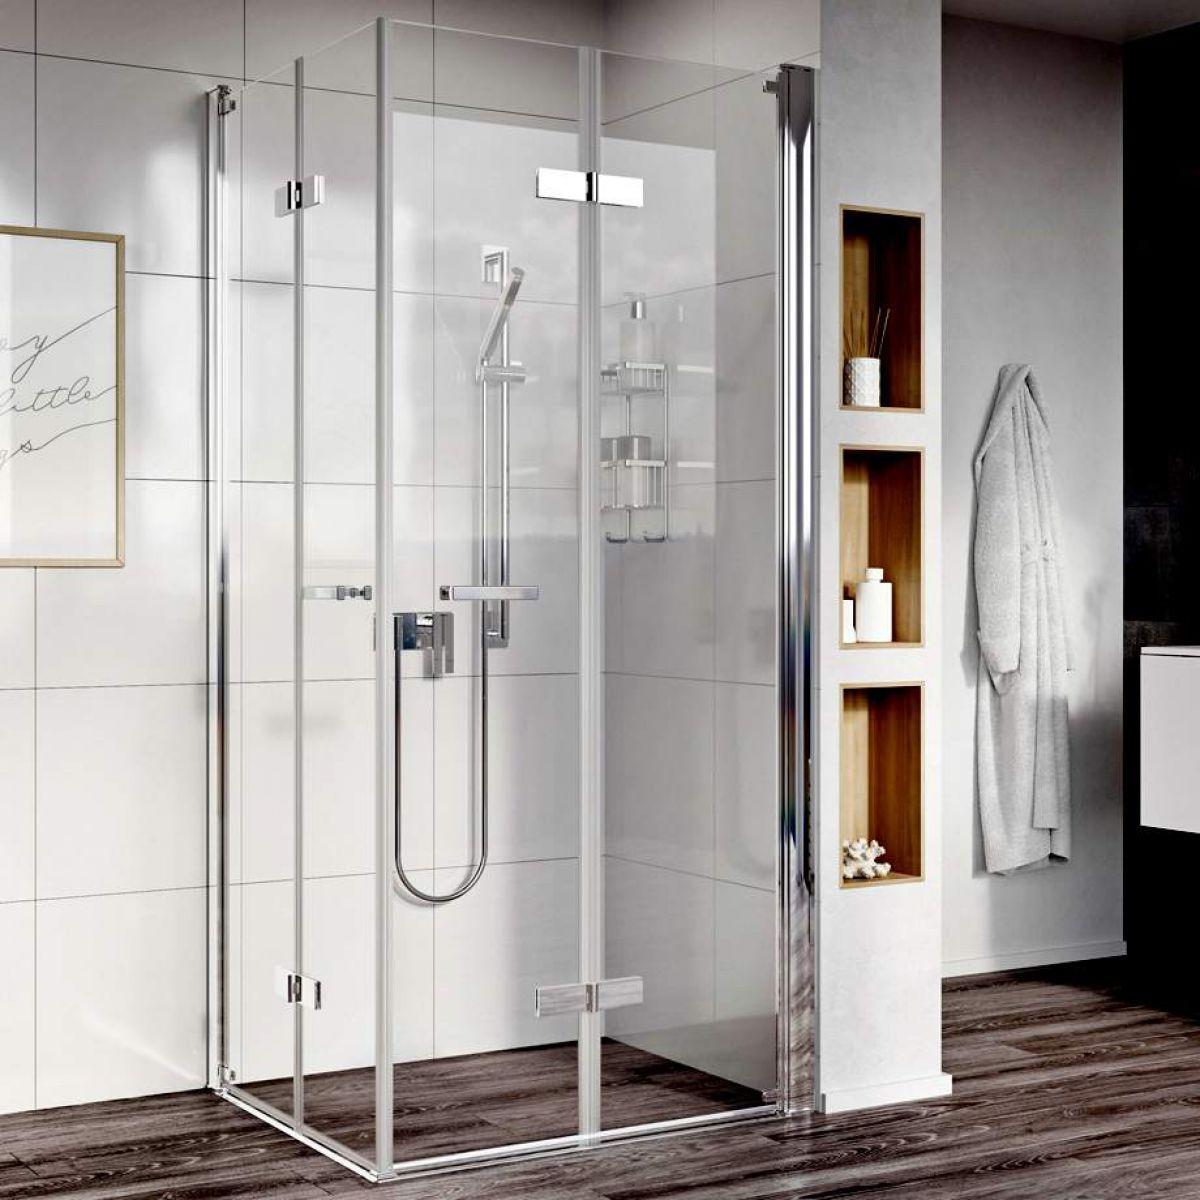 Roman Showers Innov8 Bi Fold Easy Access Corner Enclosure